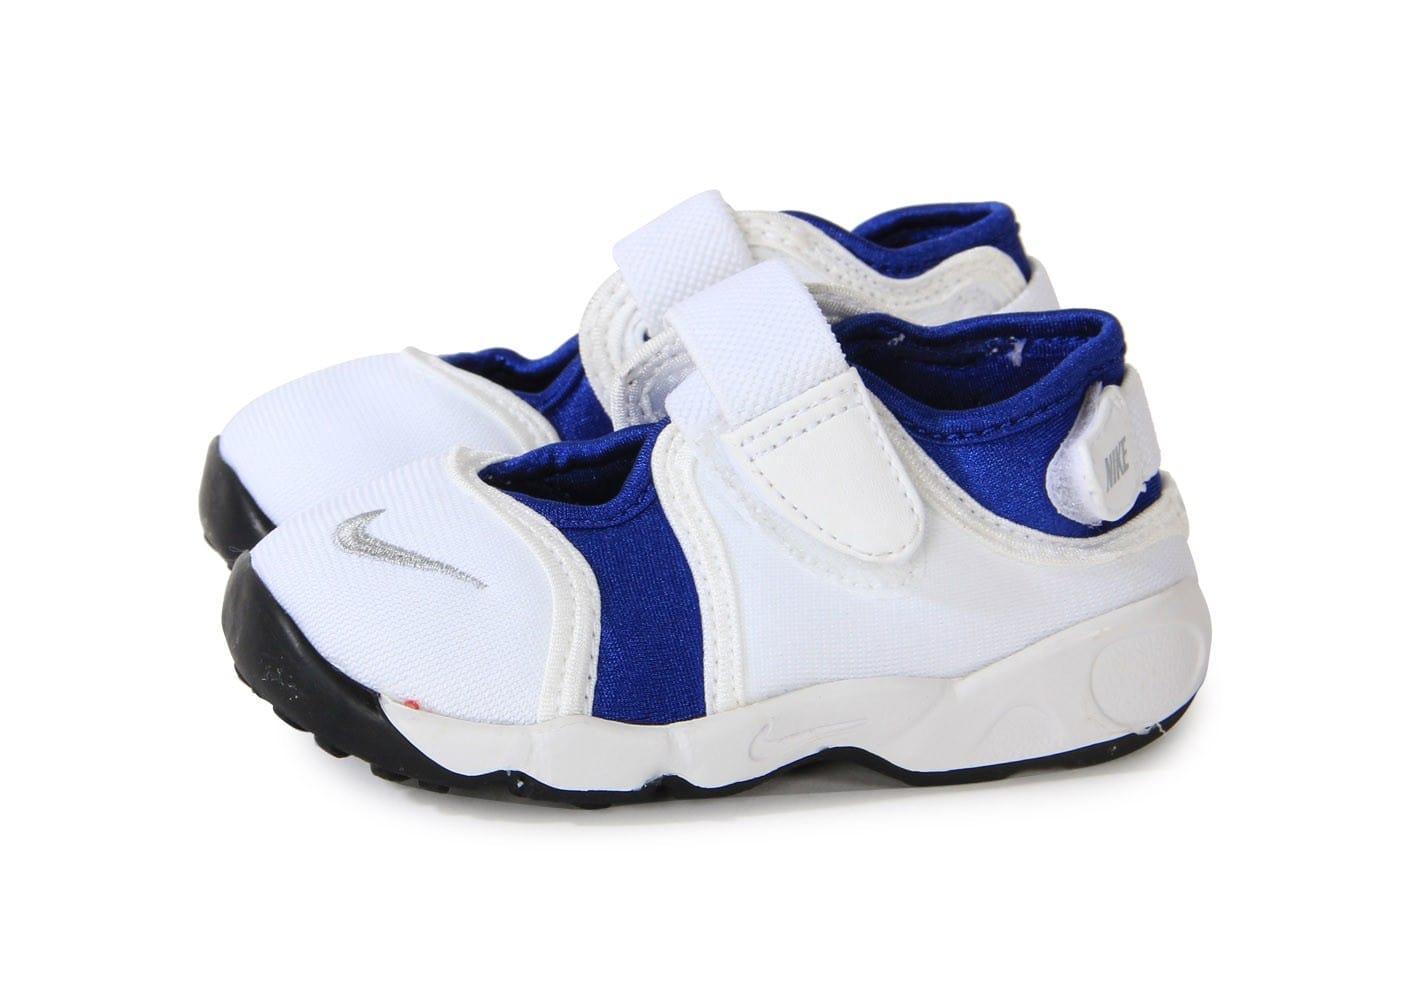 ninja nike enfant Shop Clothing & Shoes Online